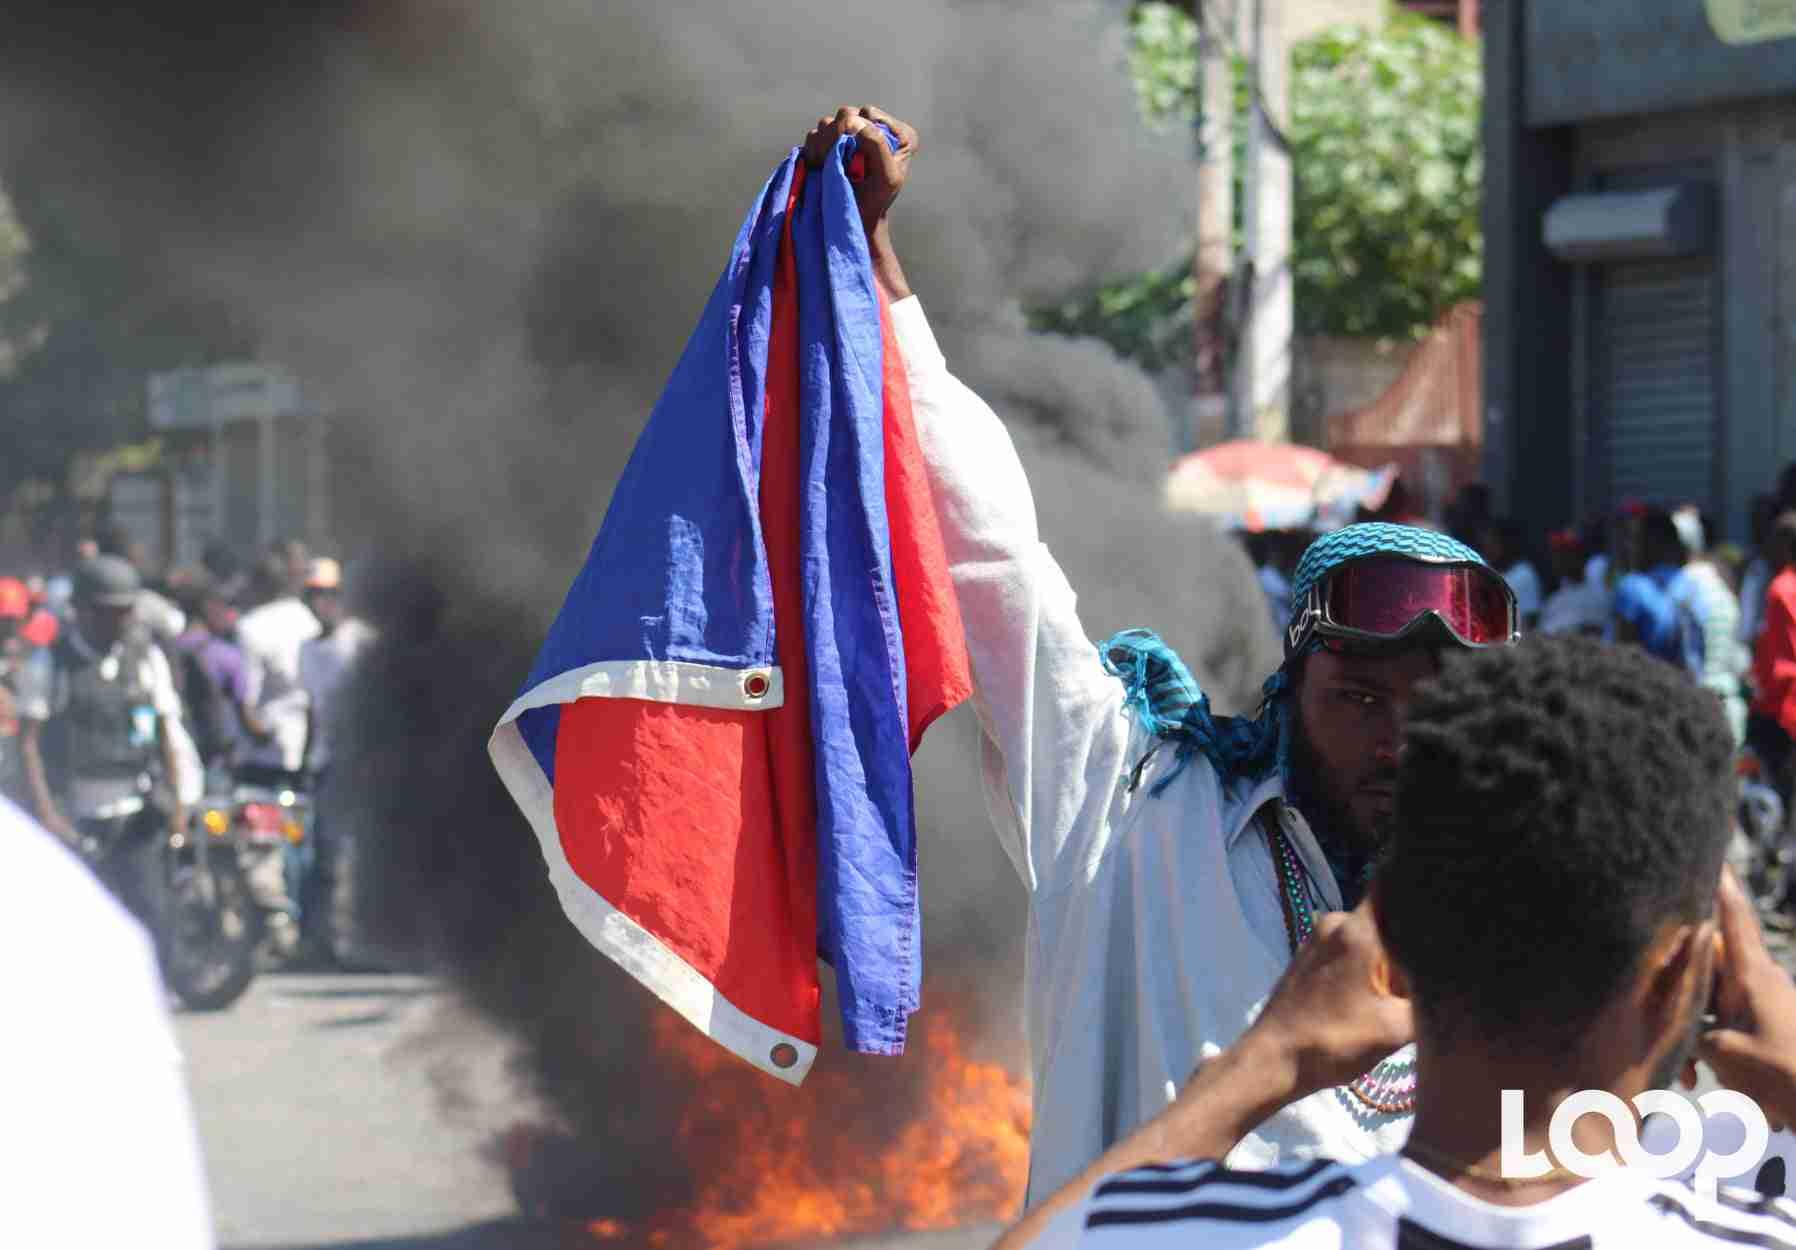 demonstrations in Haiti 2019 October